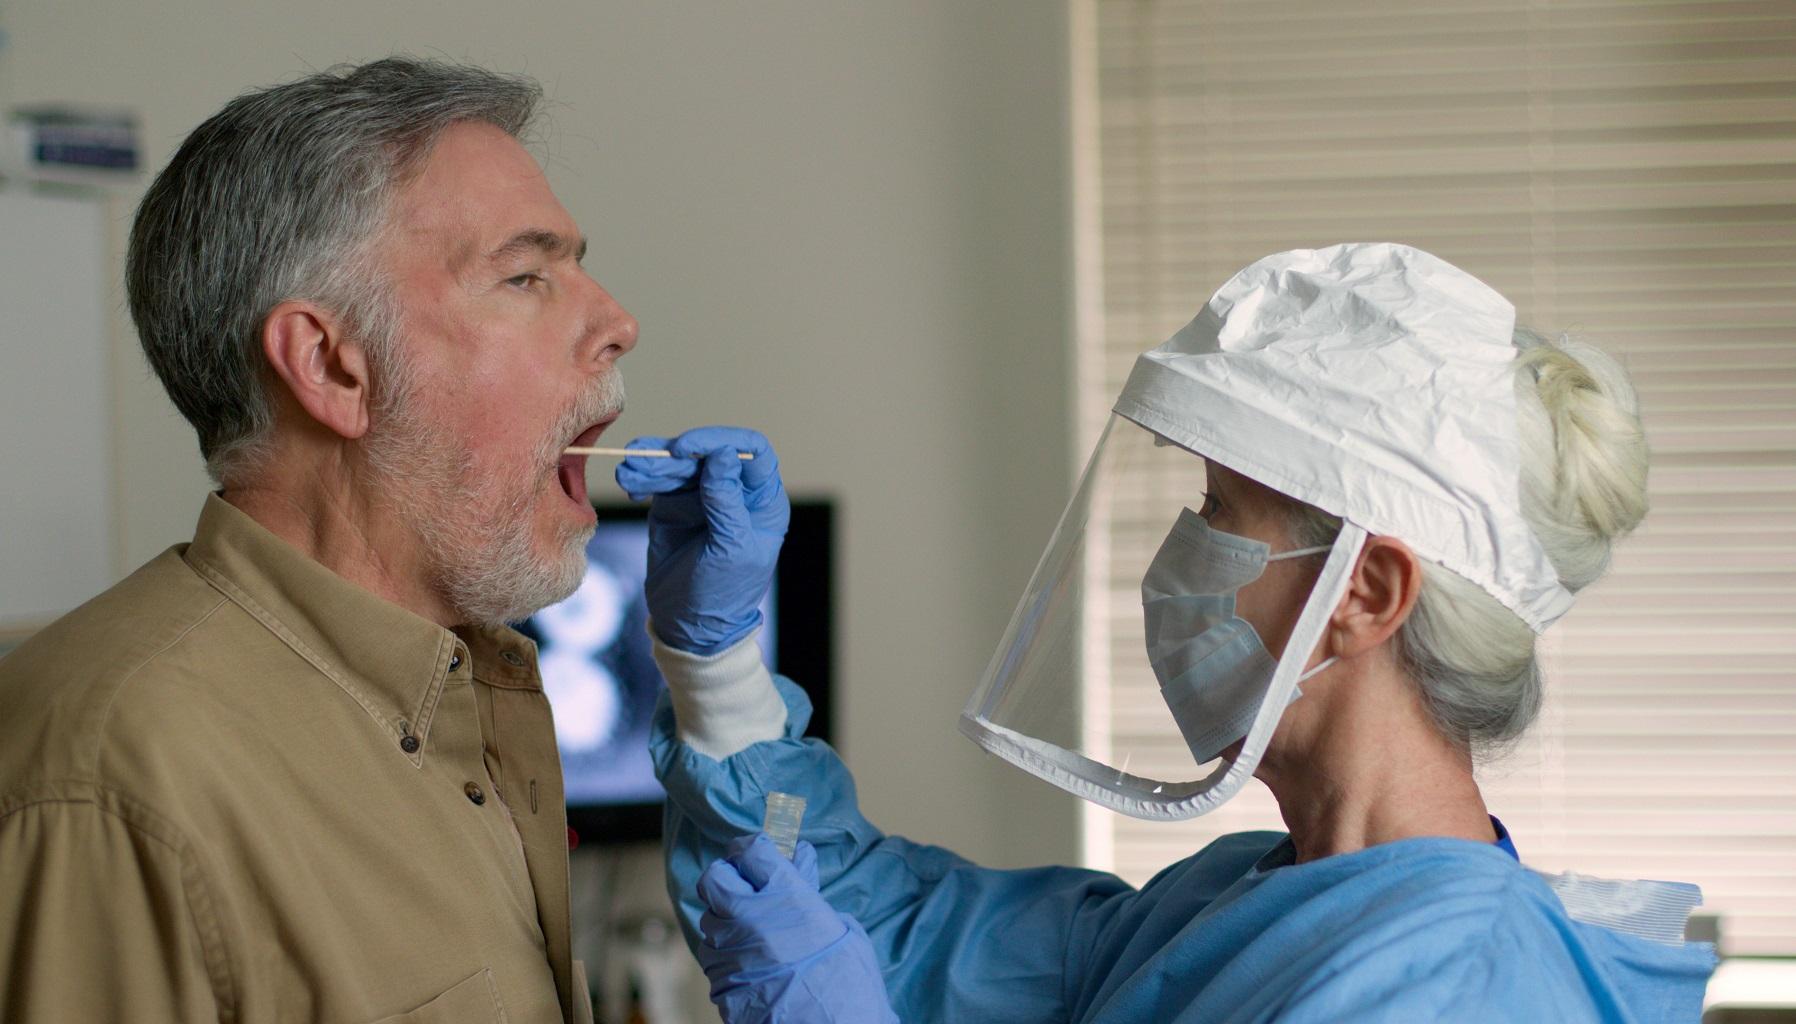 Coronavirus posso riprenderlo?